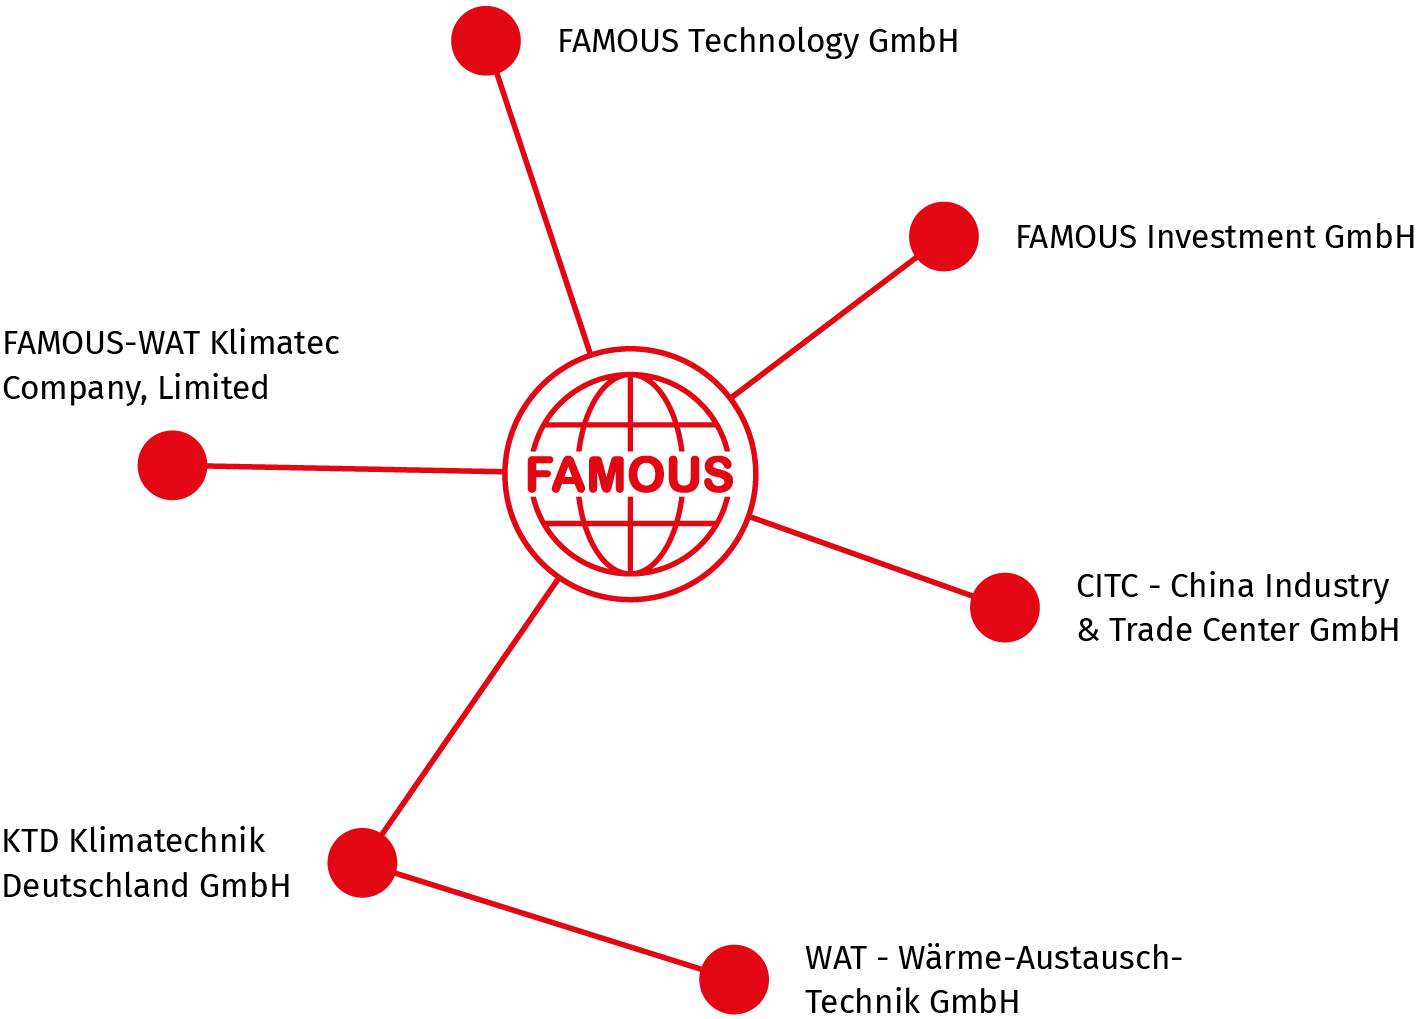 Firmenstruktur der Famous Industrial Group